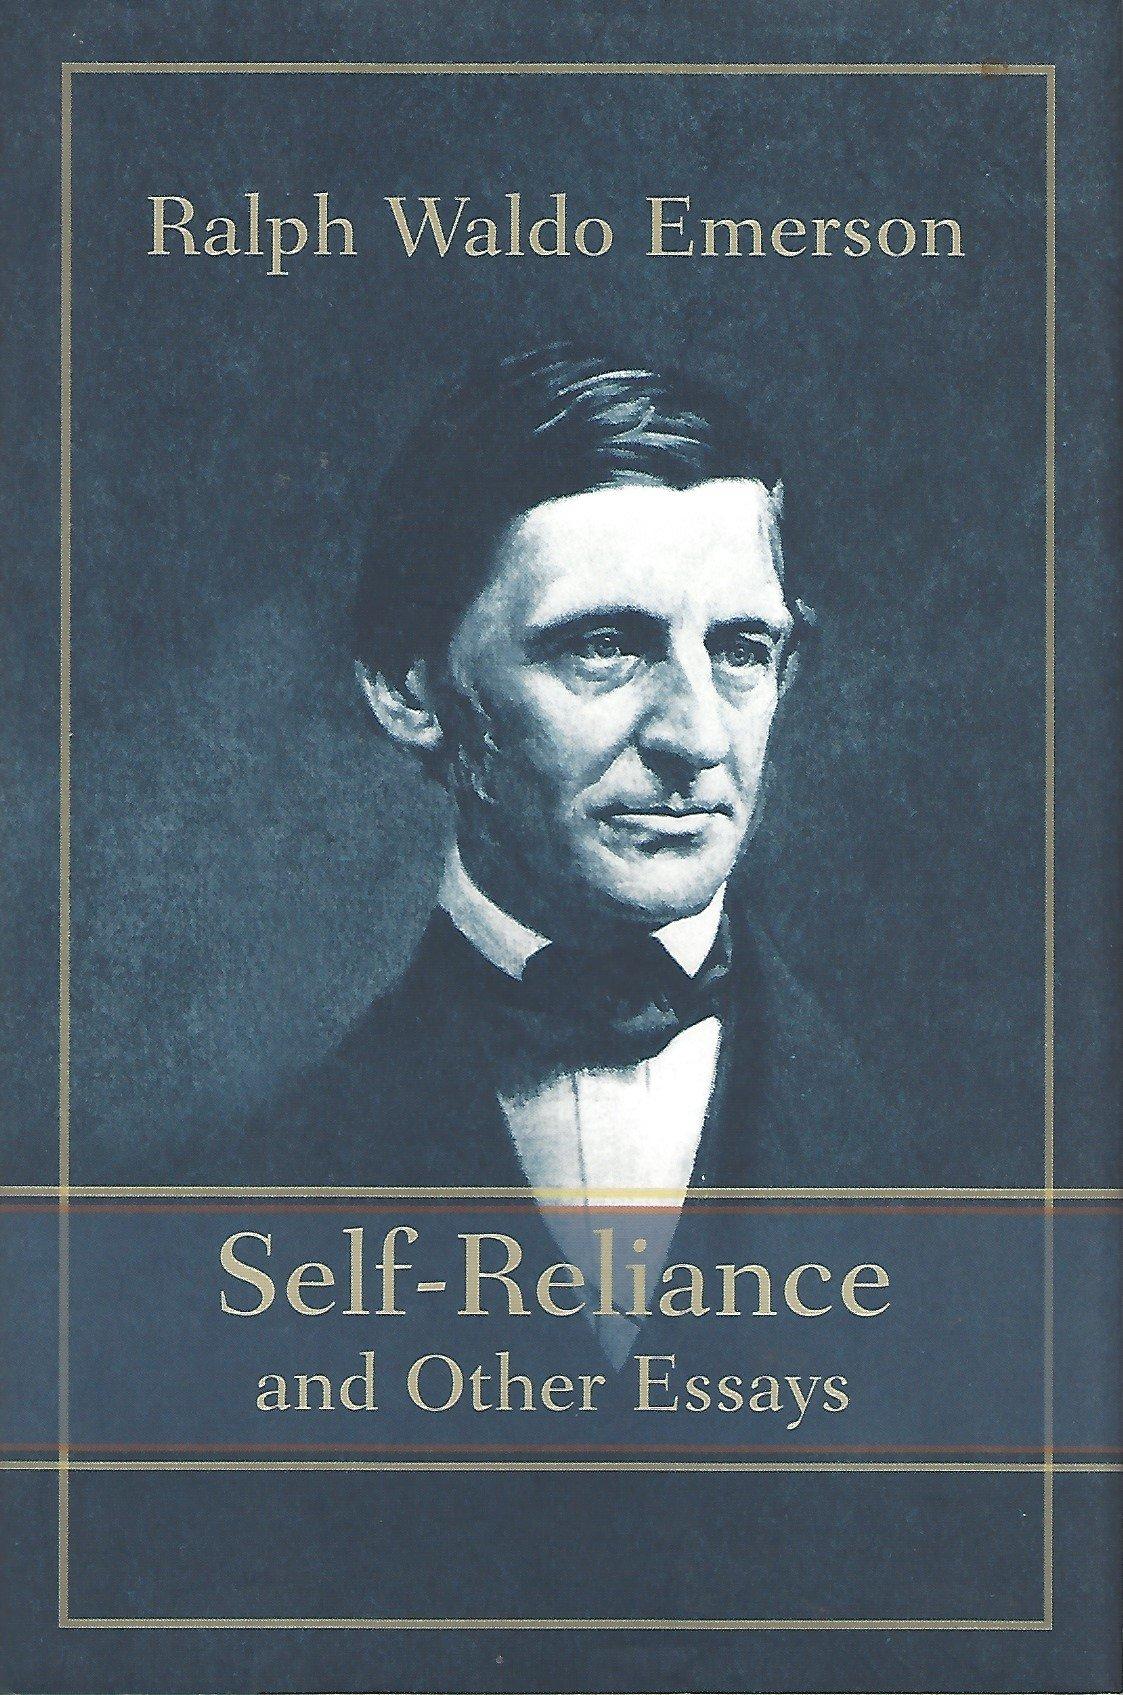 self-reliance book cover.jpg